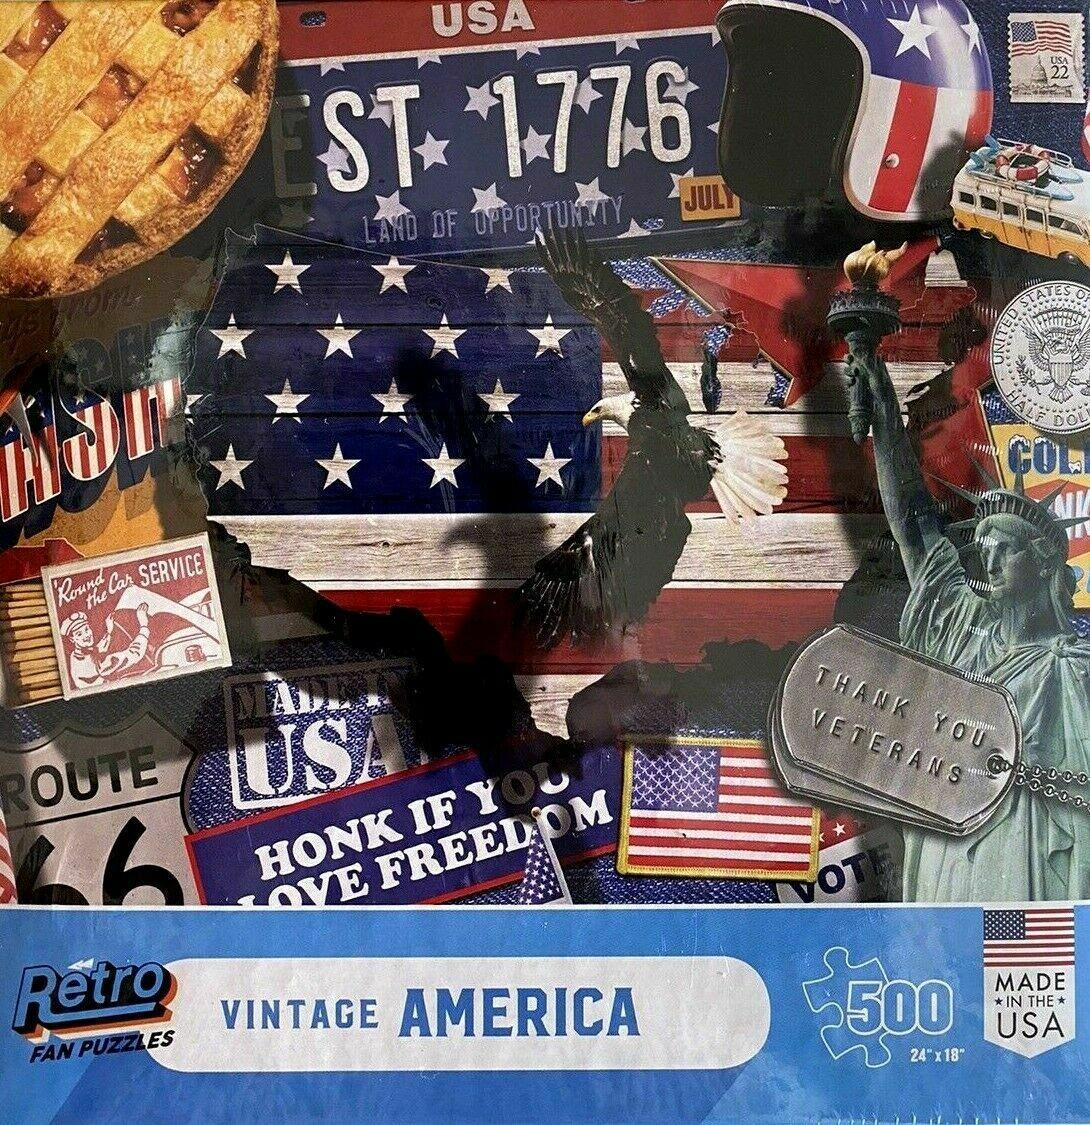 "RETRO VINTAGE AMERICA - 500 PIECE PUZZLE - RETRO FAN PUZZLES USA SEALED 24""X18"""